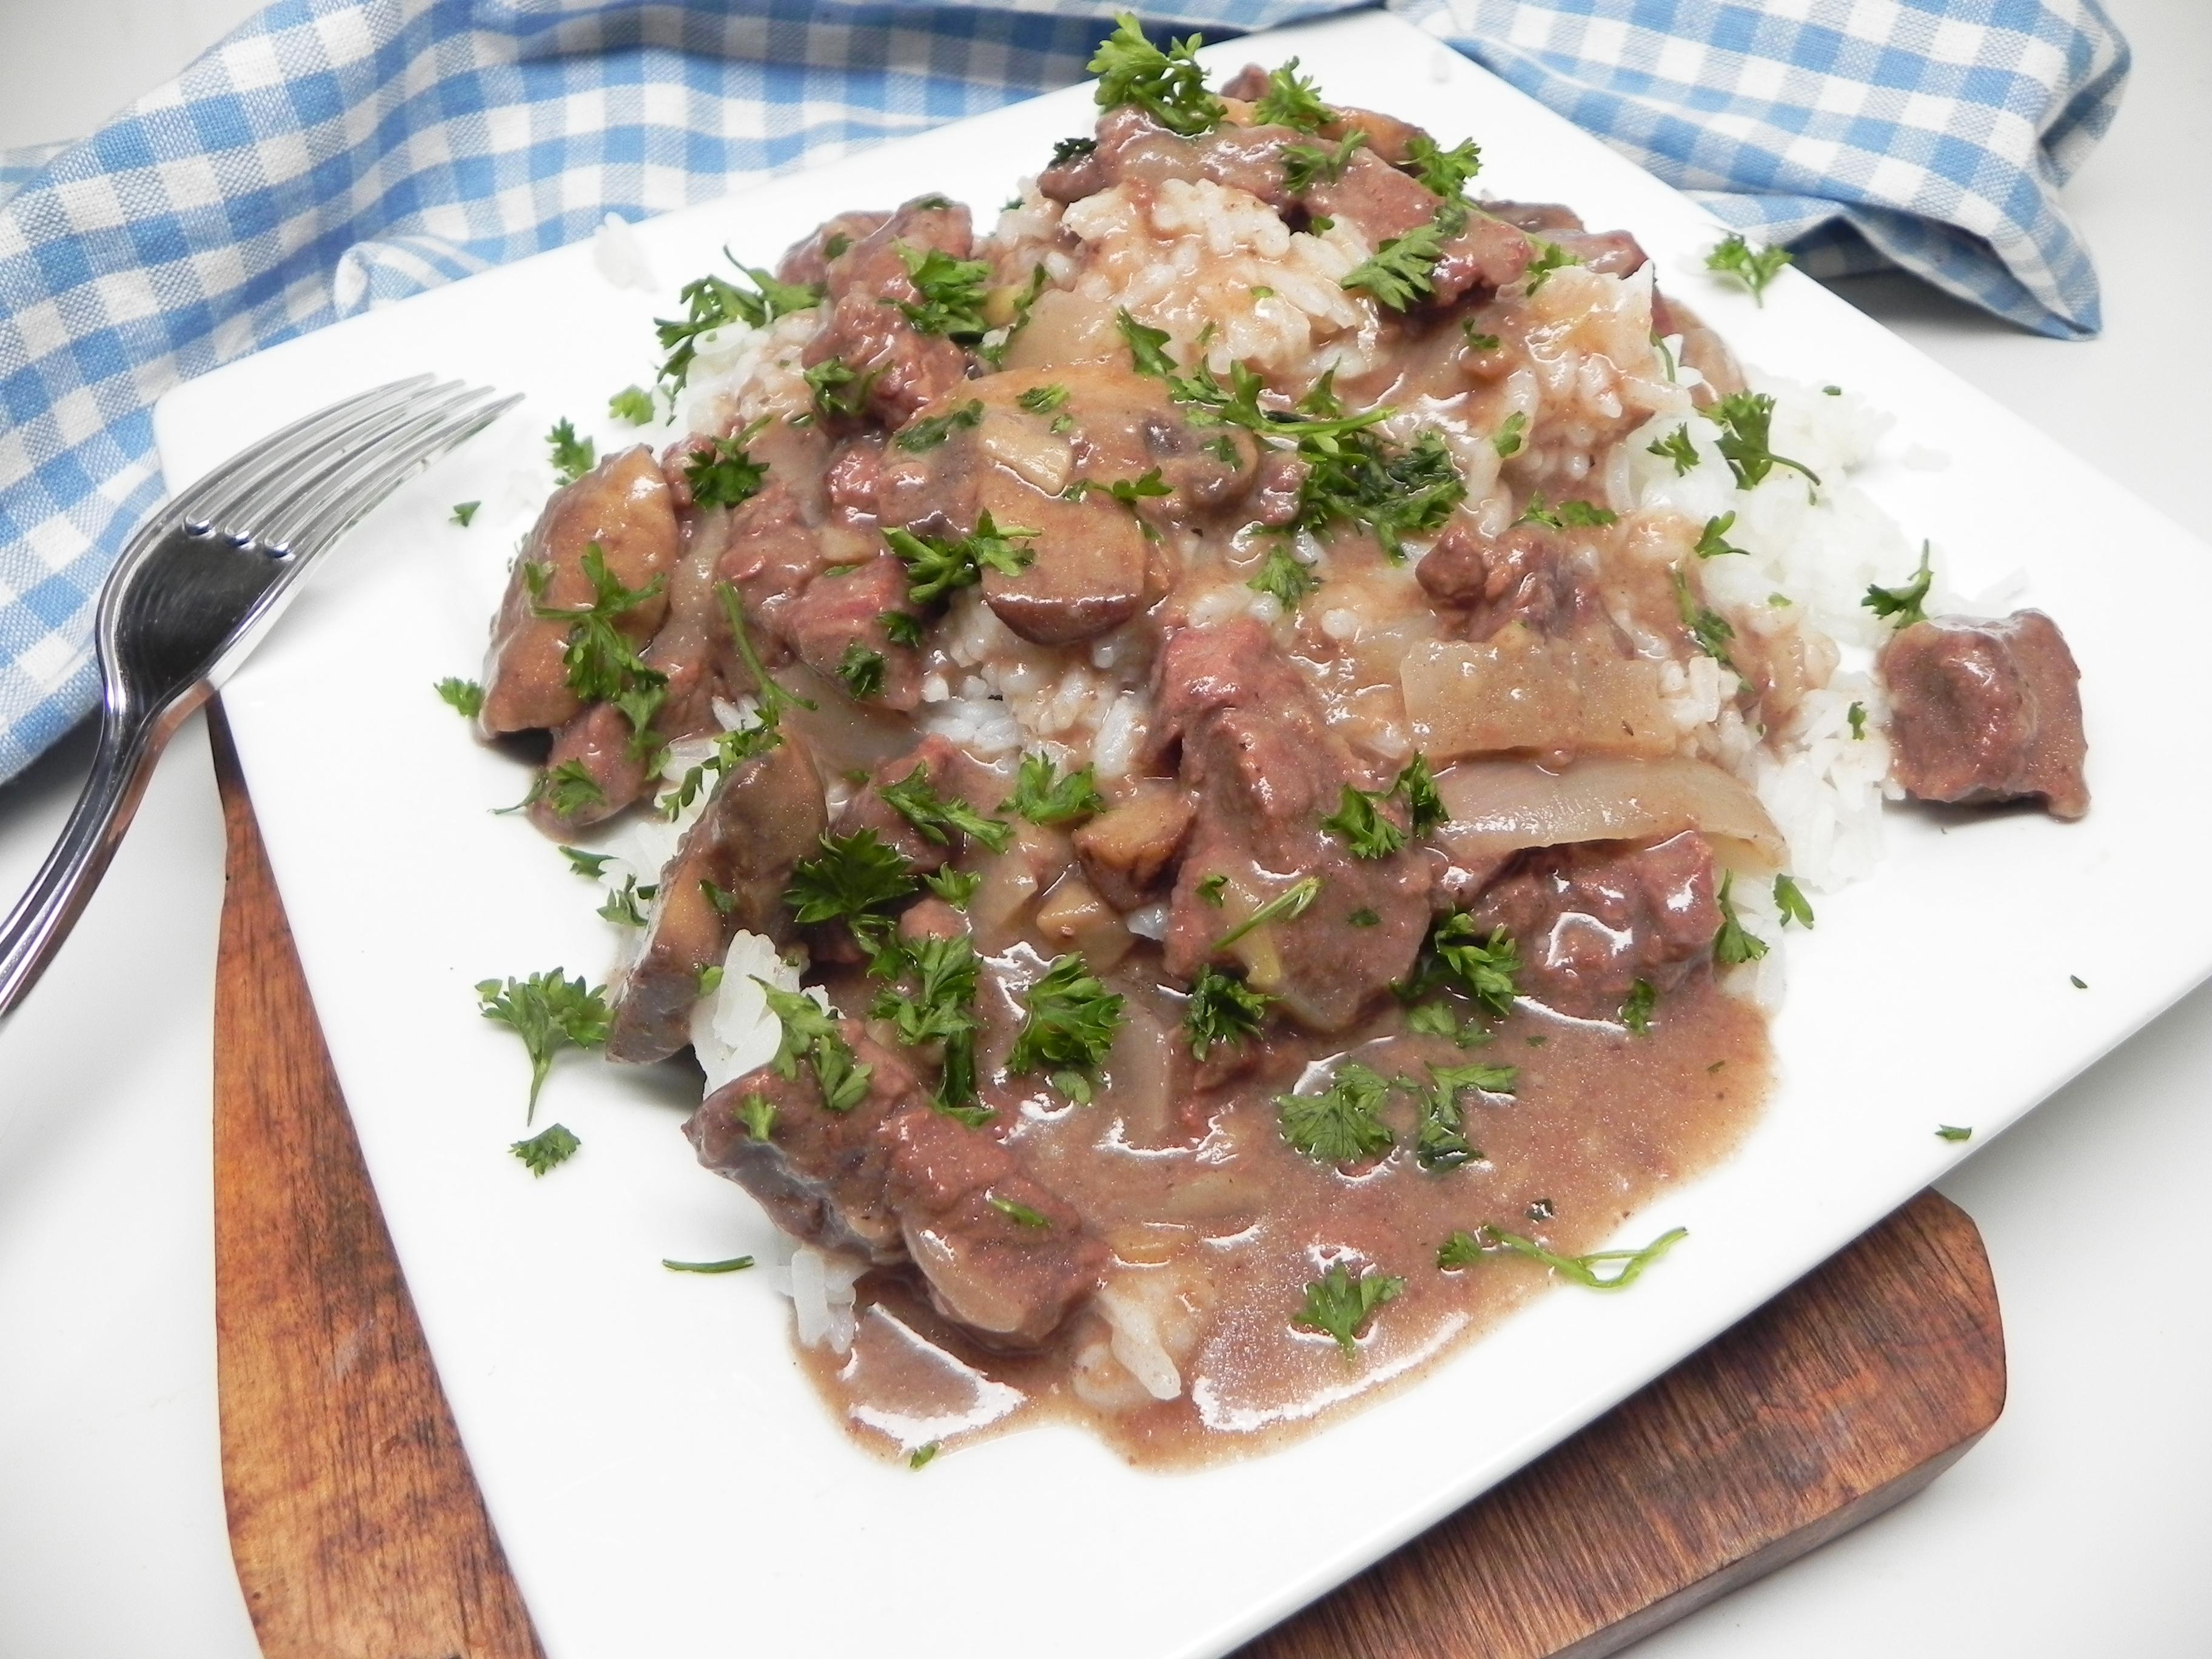 Instant Pot® Beef Tips with Mushroom Gravy